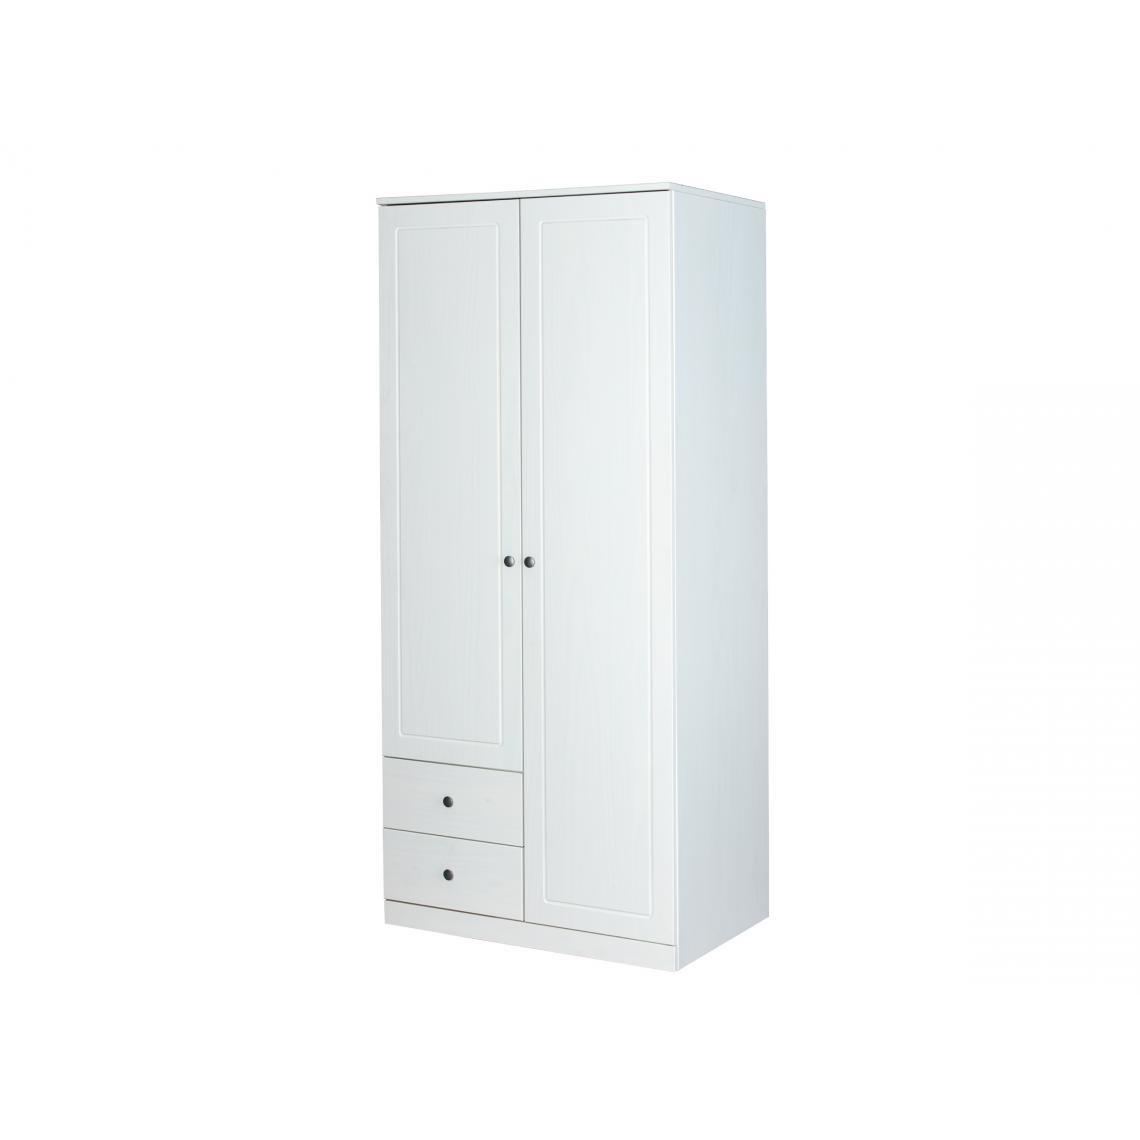 armoire penderie 2 portes en pin massif blanc rita  3 suisses